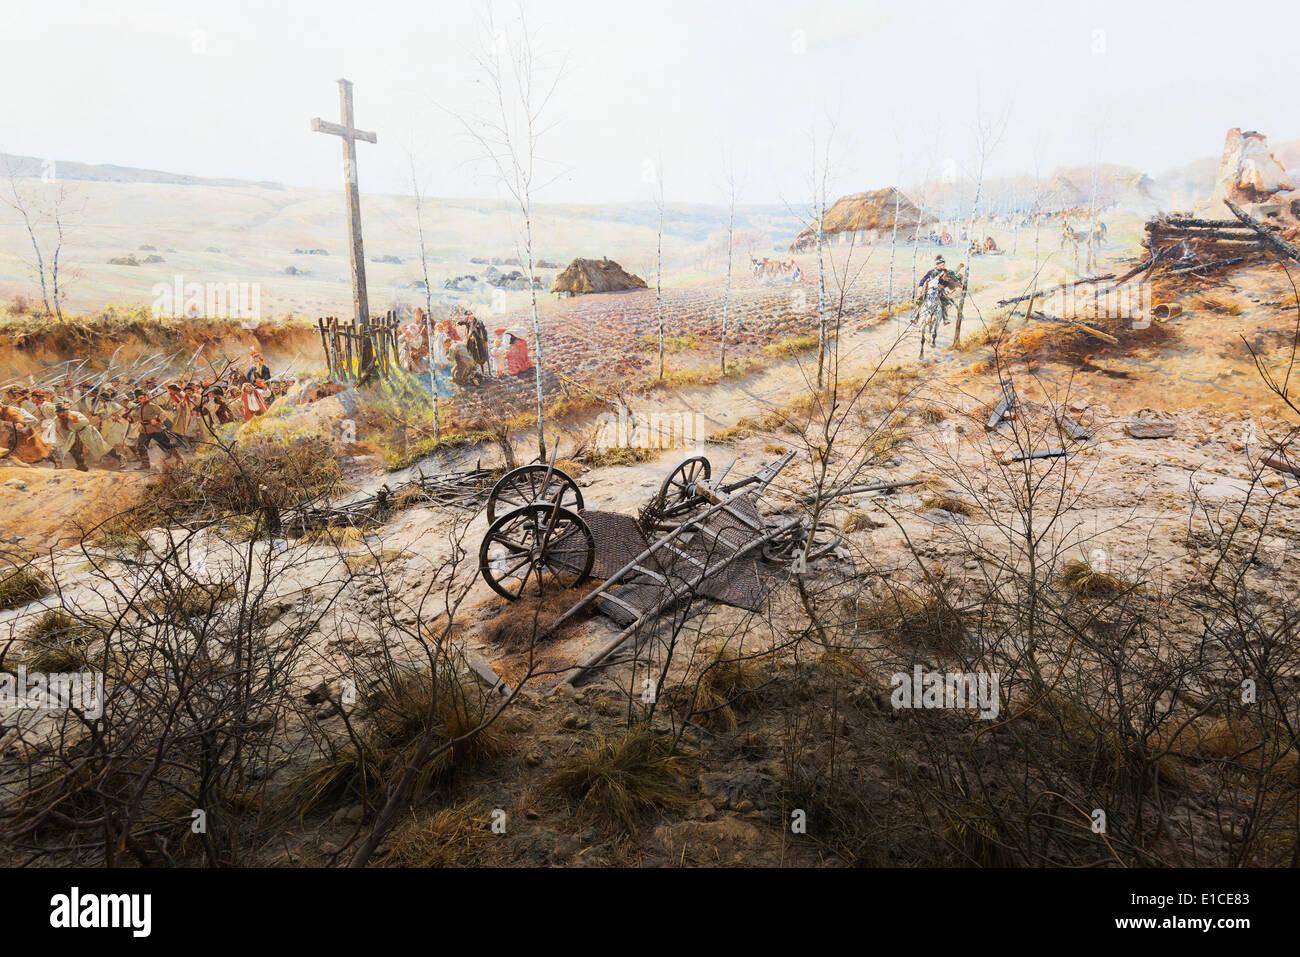 Europe, Poland, Silesia, Wroclaw, Panorama of Raclawice, painting the battle of Raclawice 1794, by Jan Styka Wolciech - Stock Image